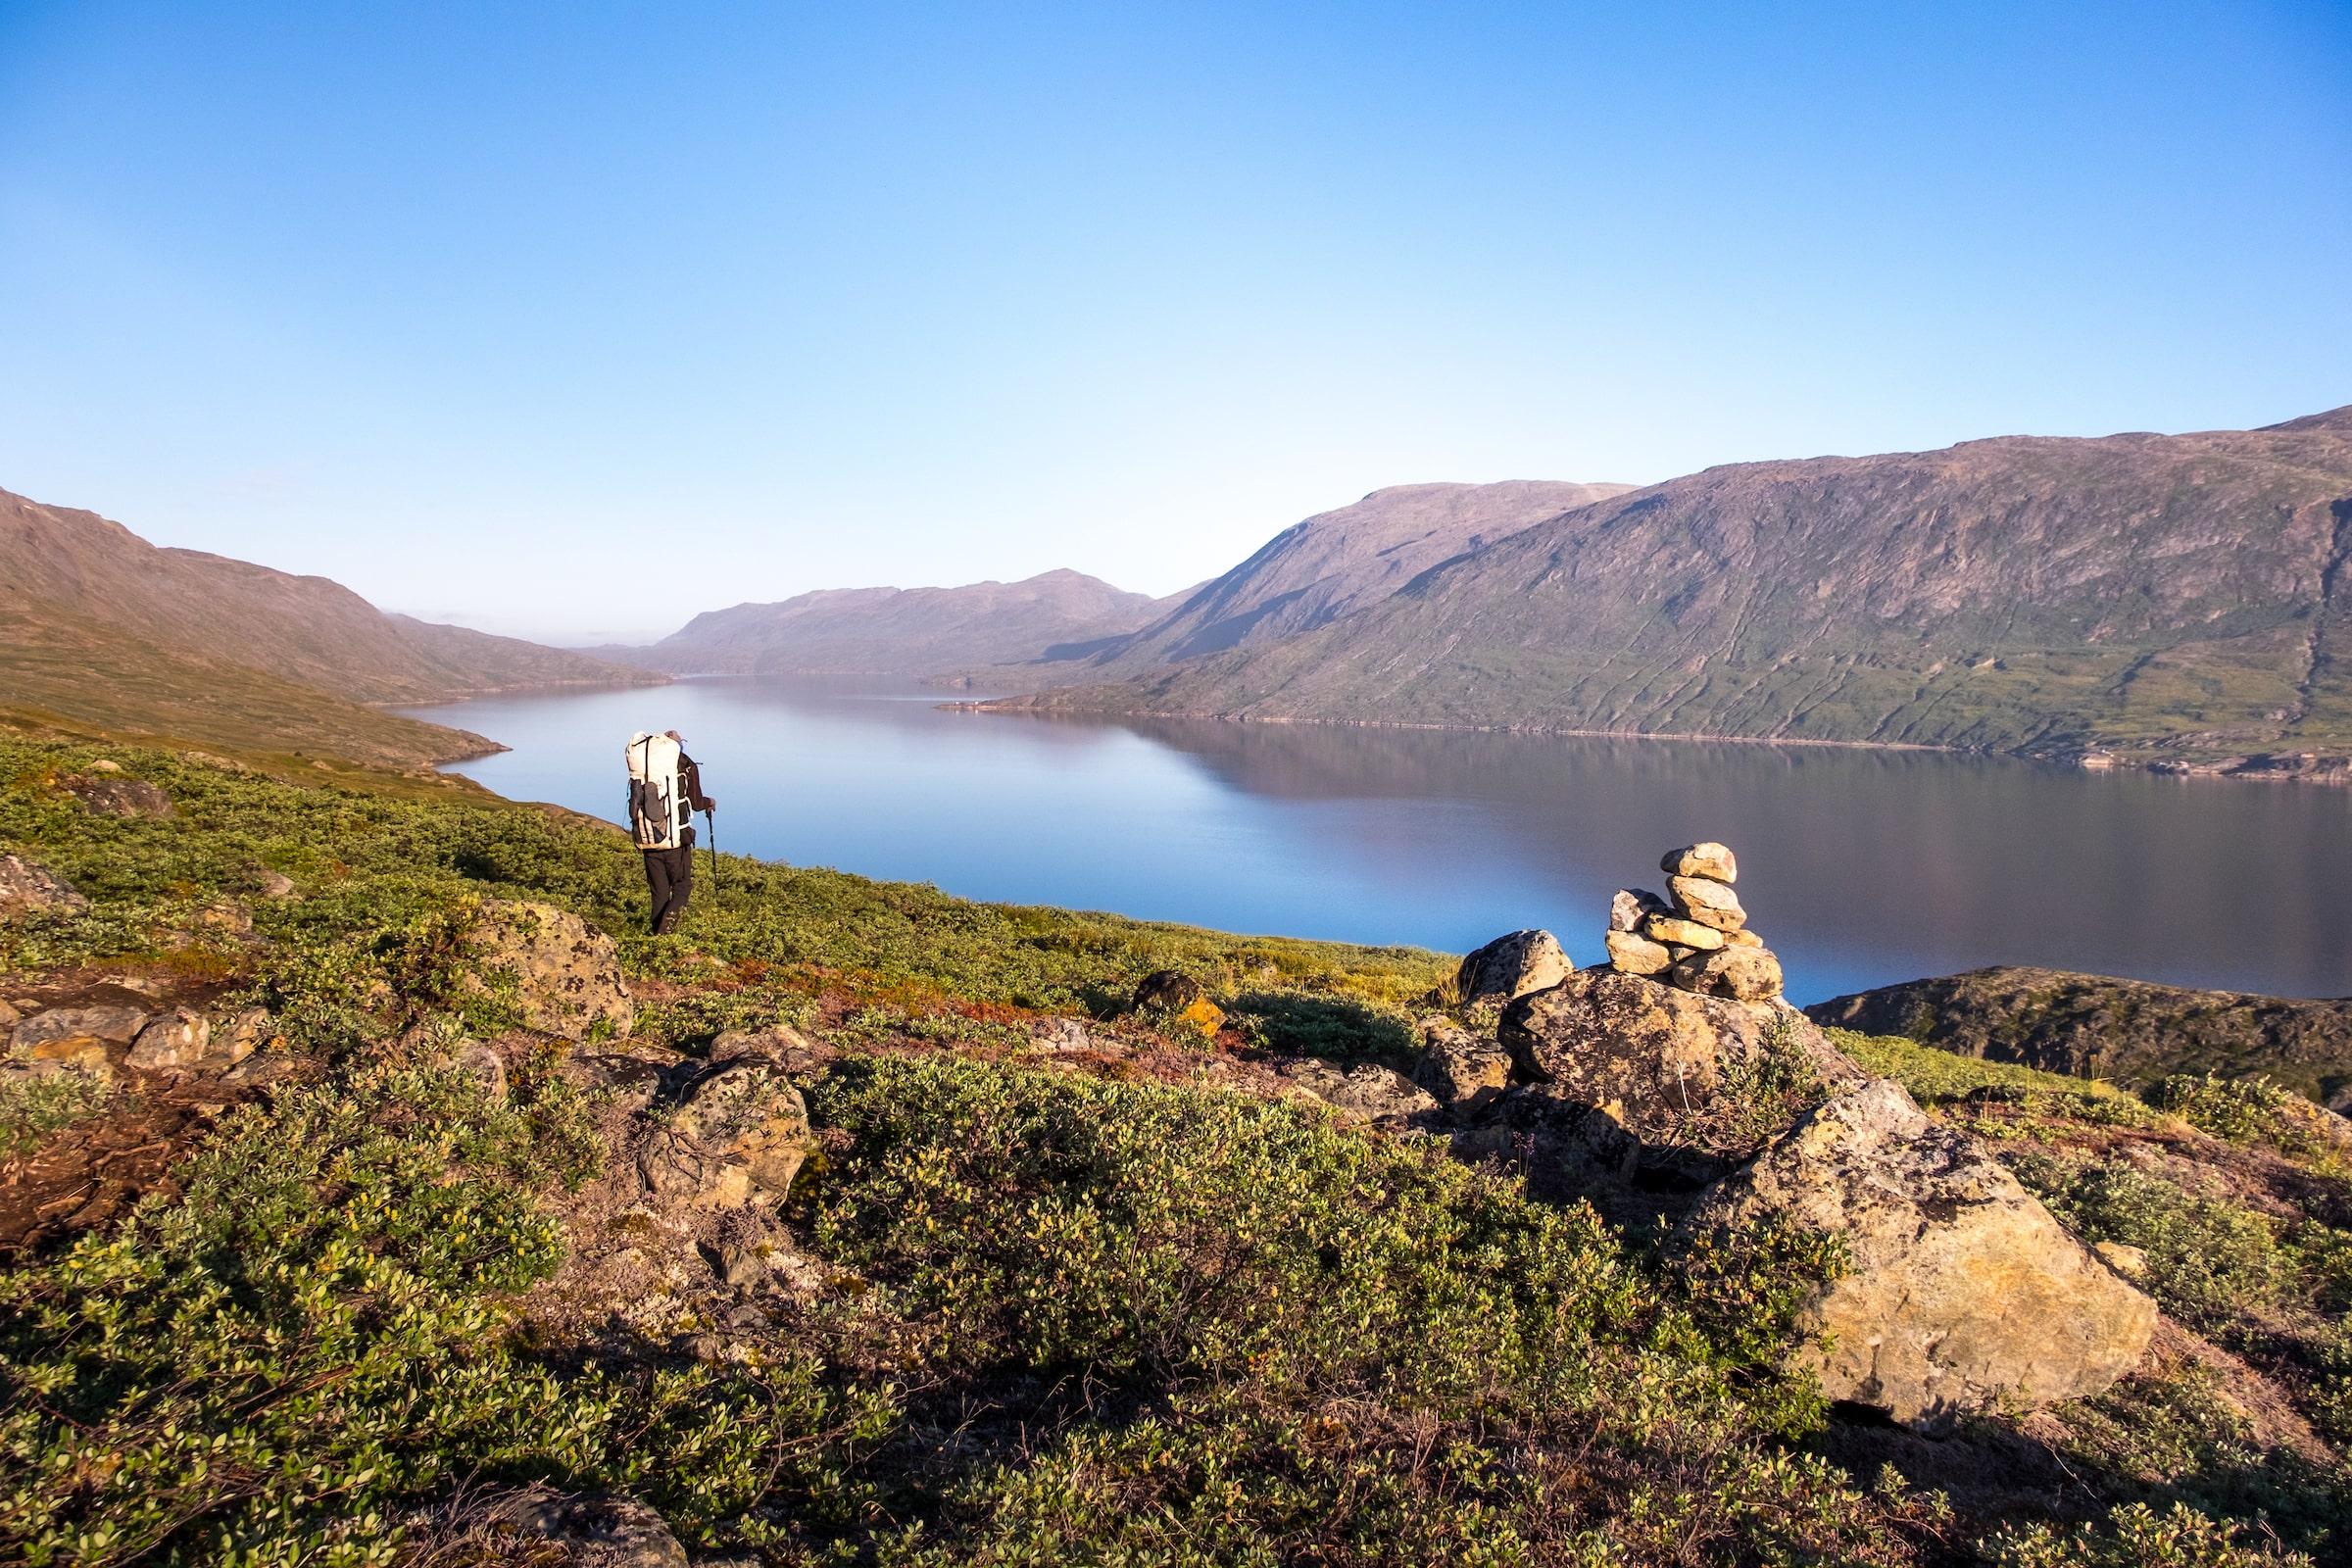 Hiker at Kangerluarsuk Tulleq fjord. Photo - Lisa Germany, Visit Greenland